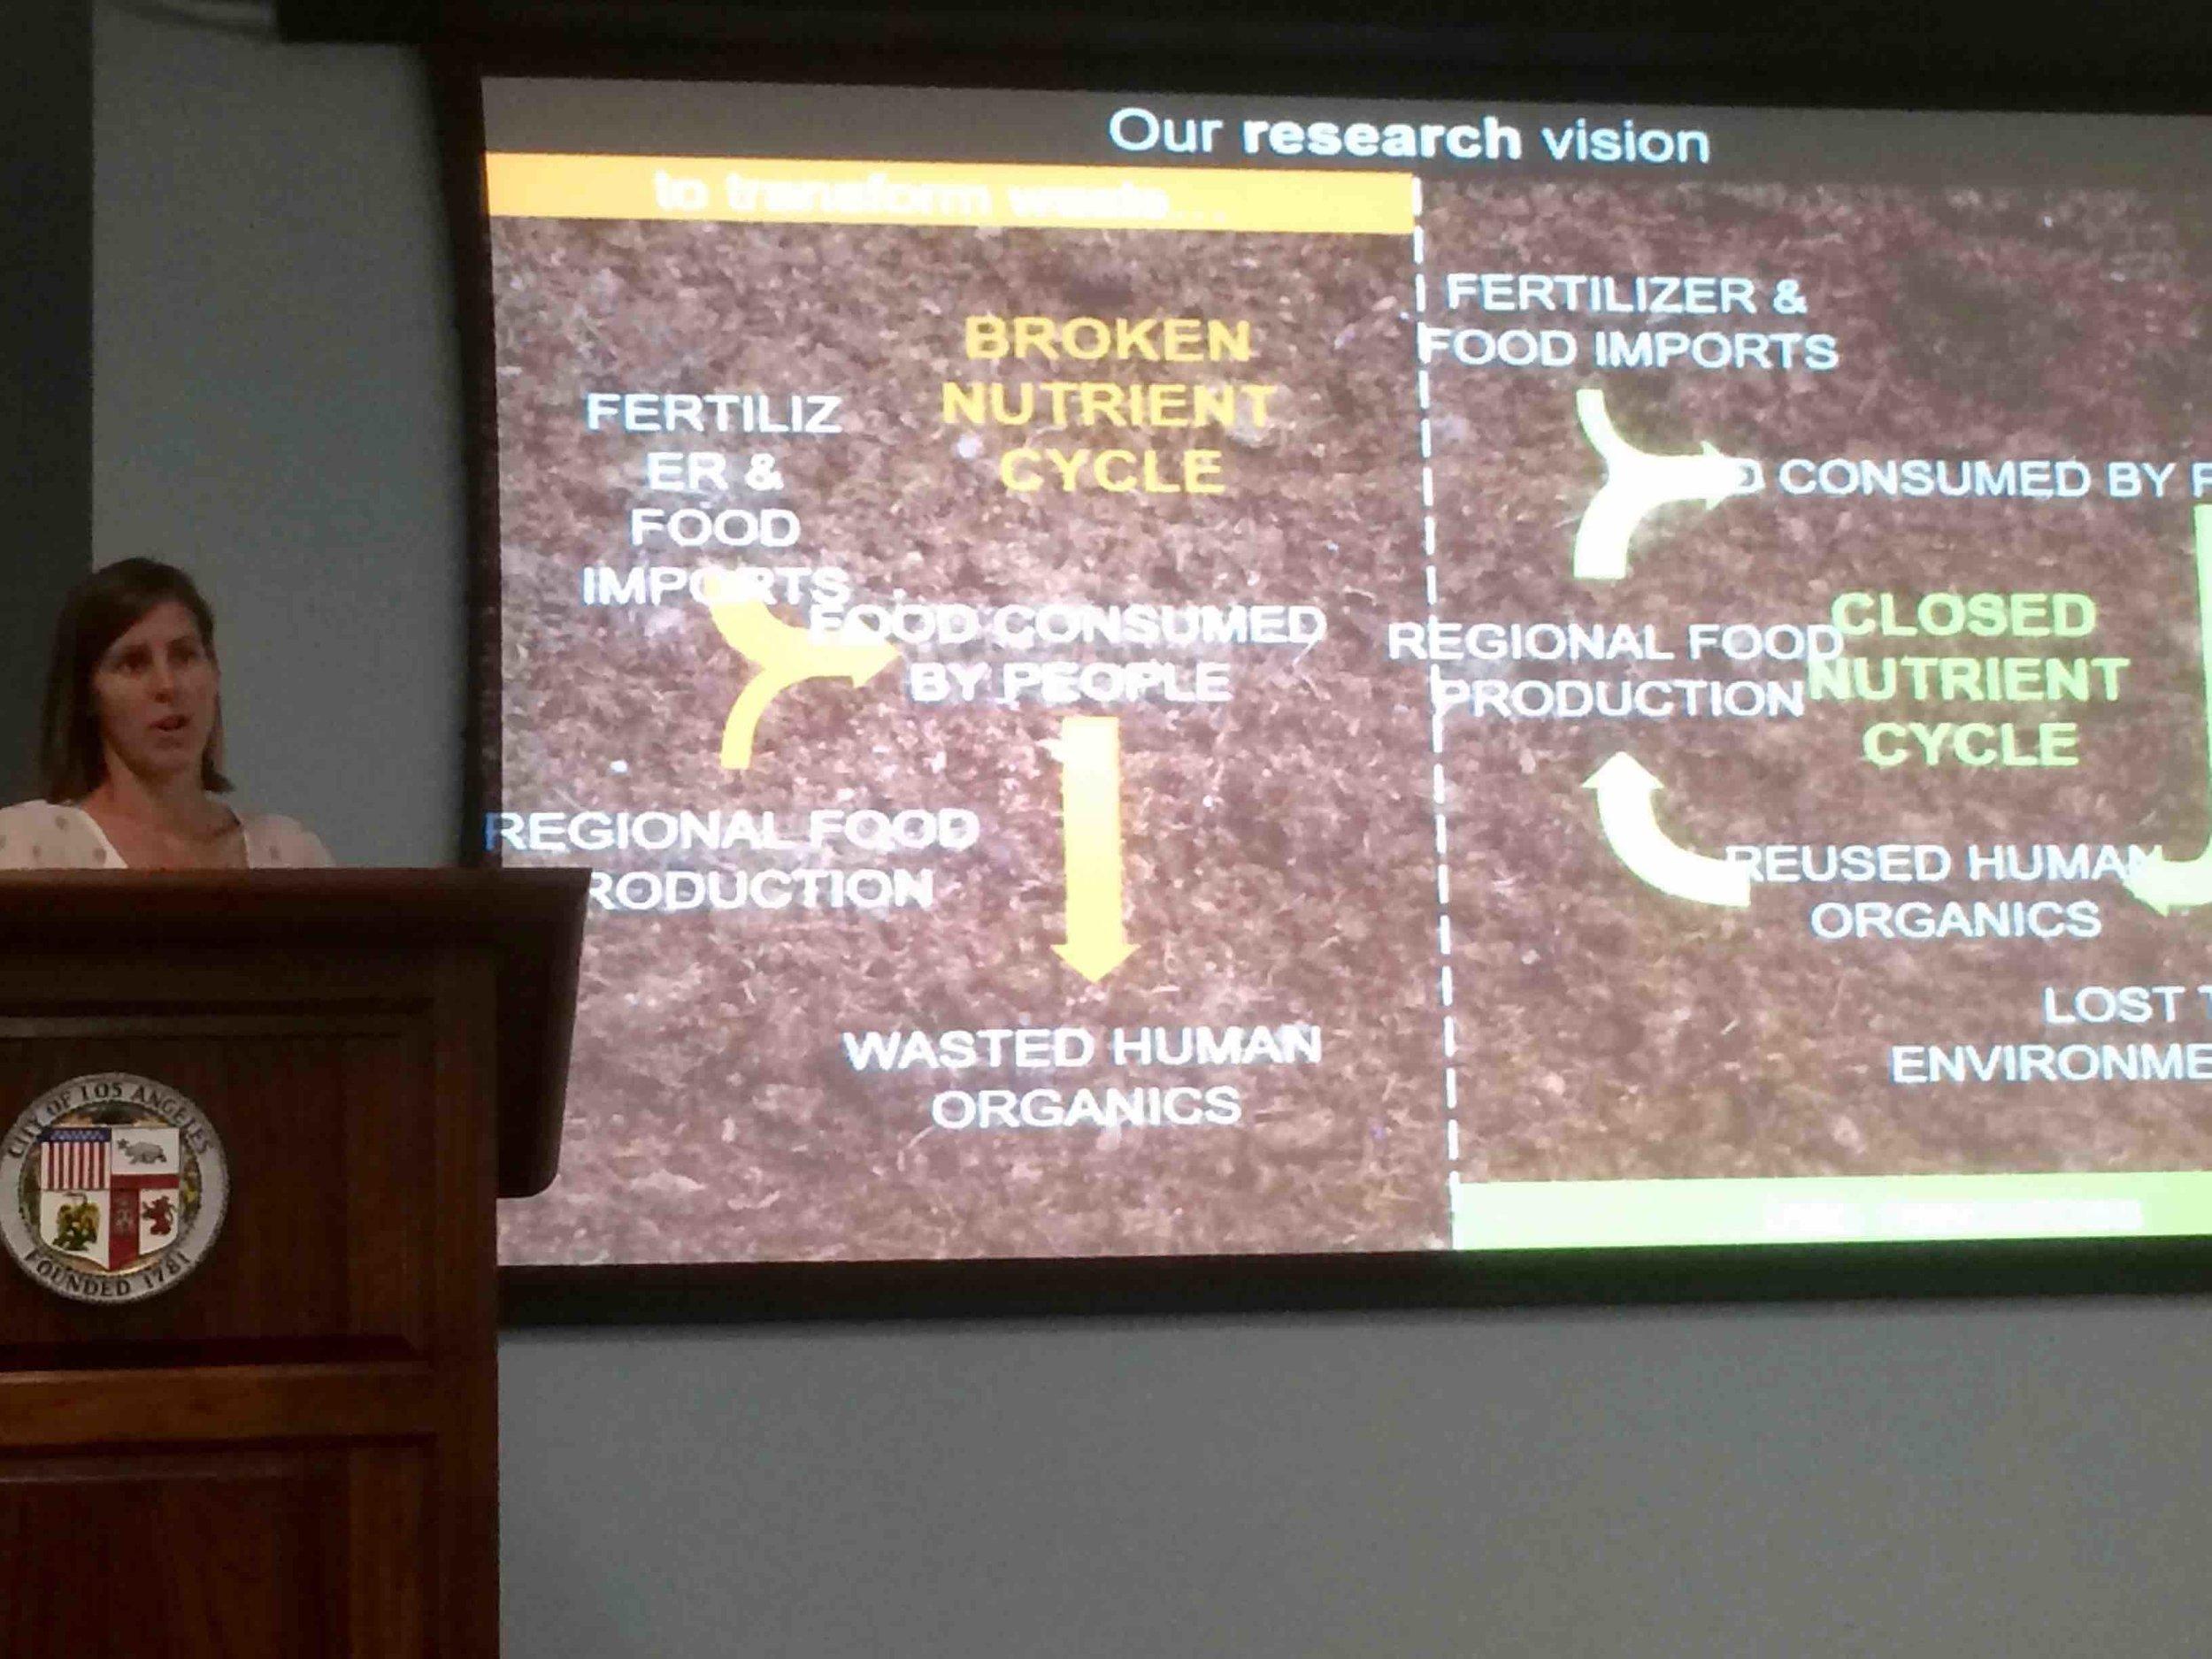 Rebecca Ryalls, Univ. of HI, envisioning closed nutrient cycles.